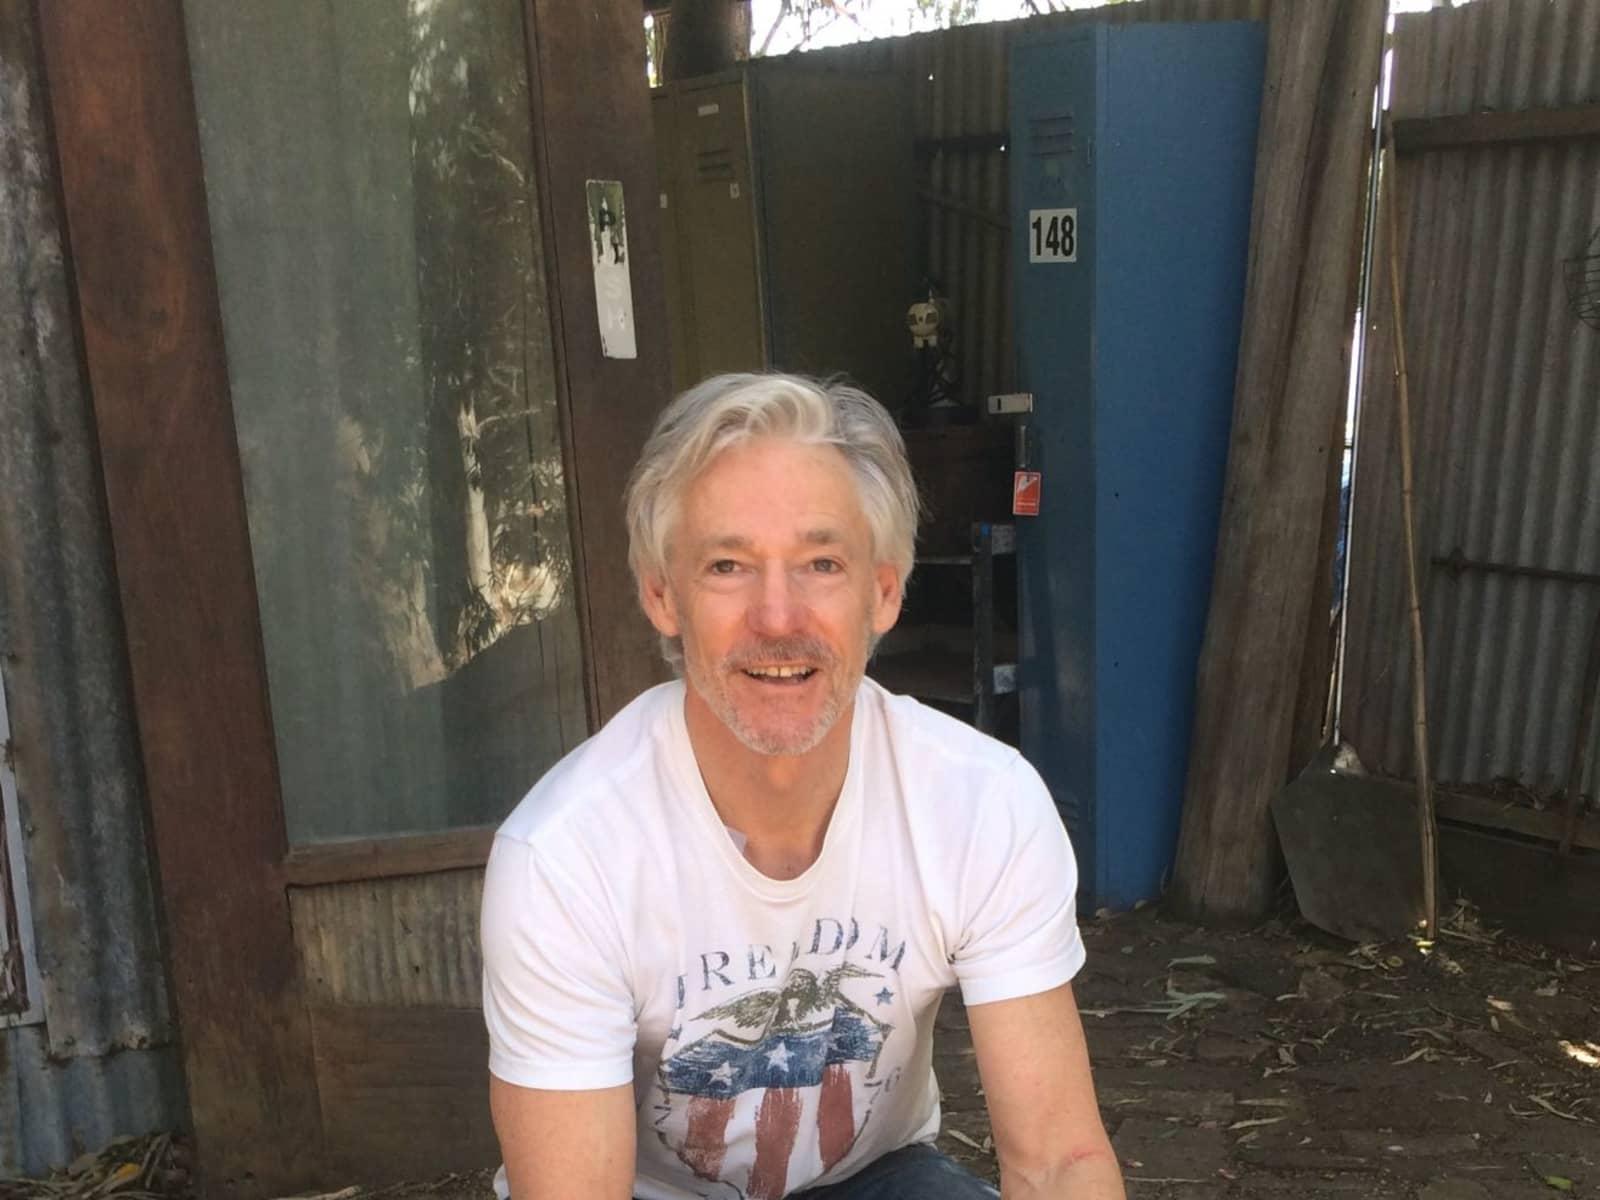 Craig from Perth, Western Australia, Australia